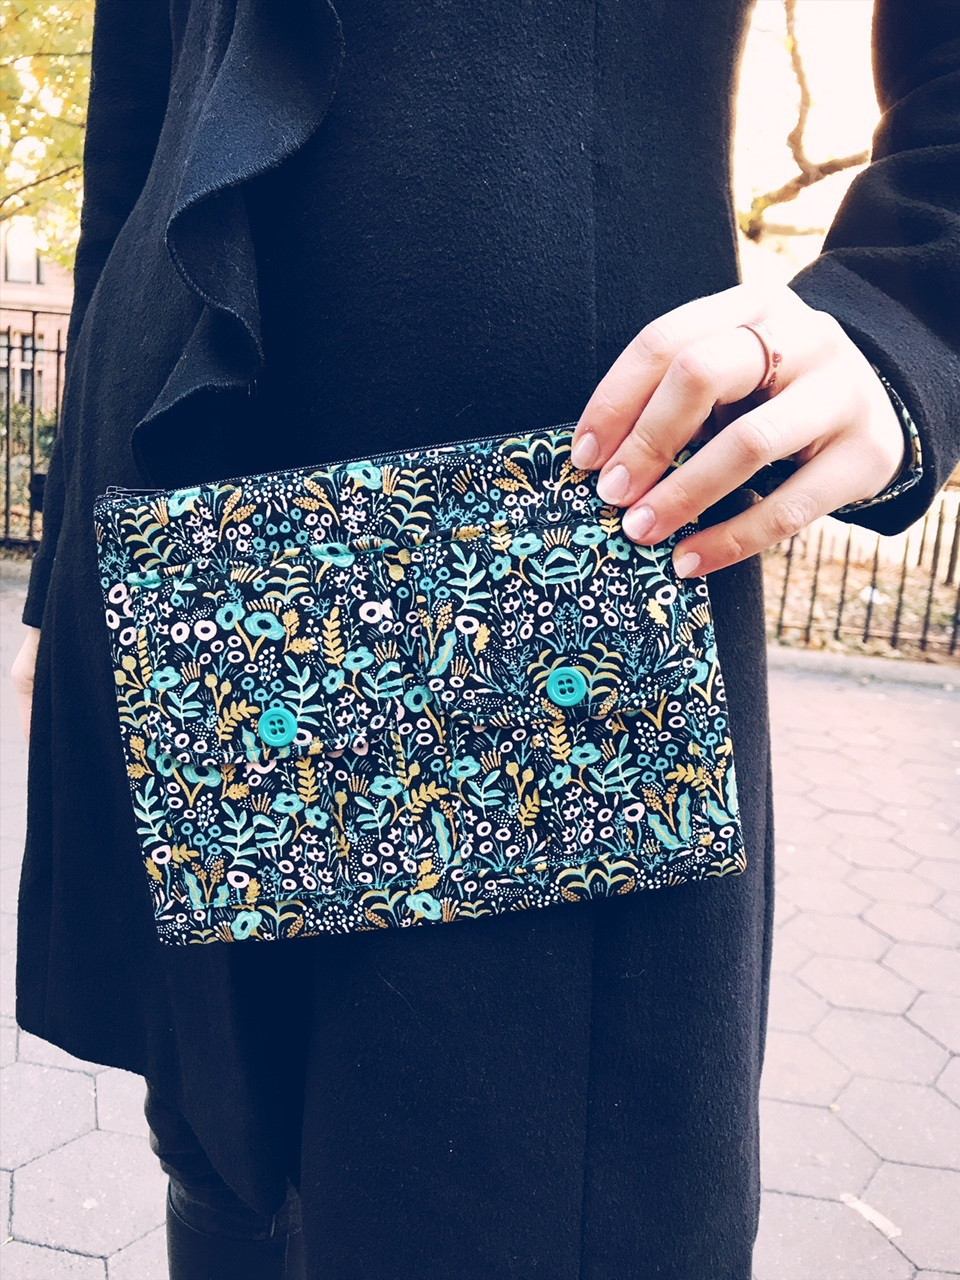 Wristlet Bag - Black Floral Print - Wristlet Wallet